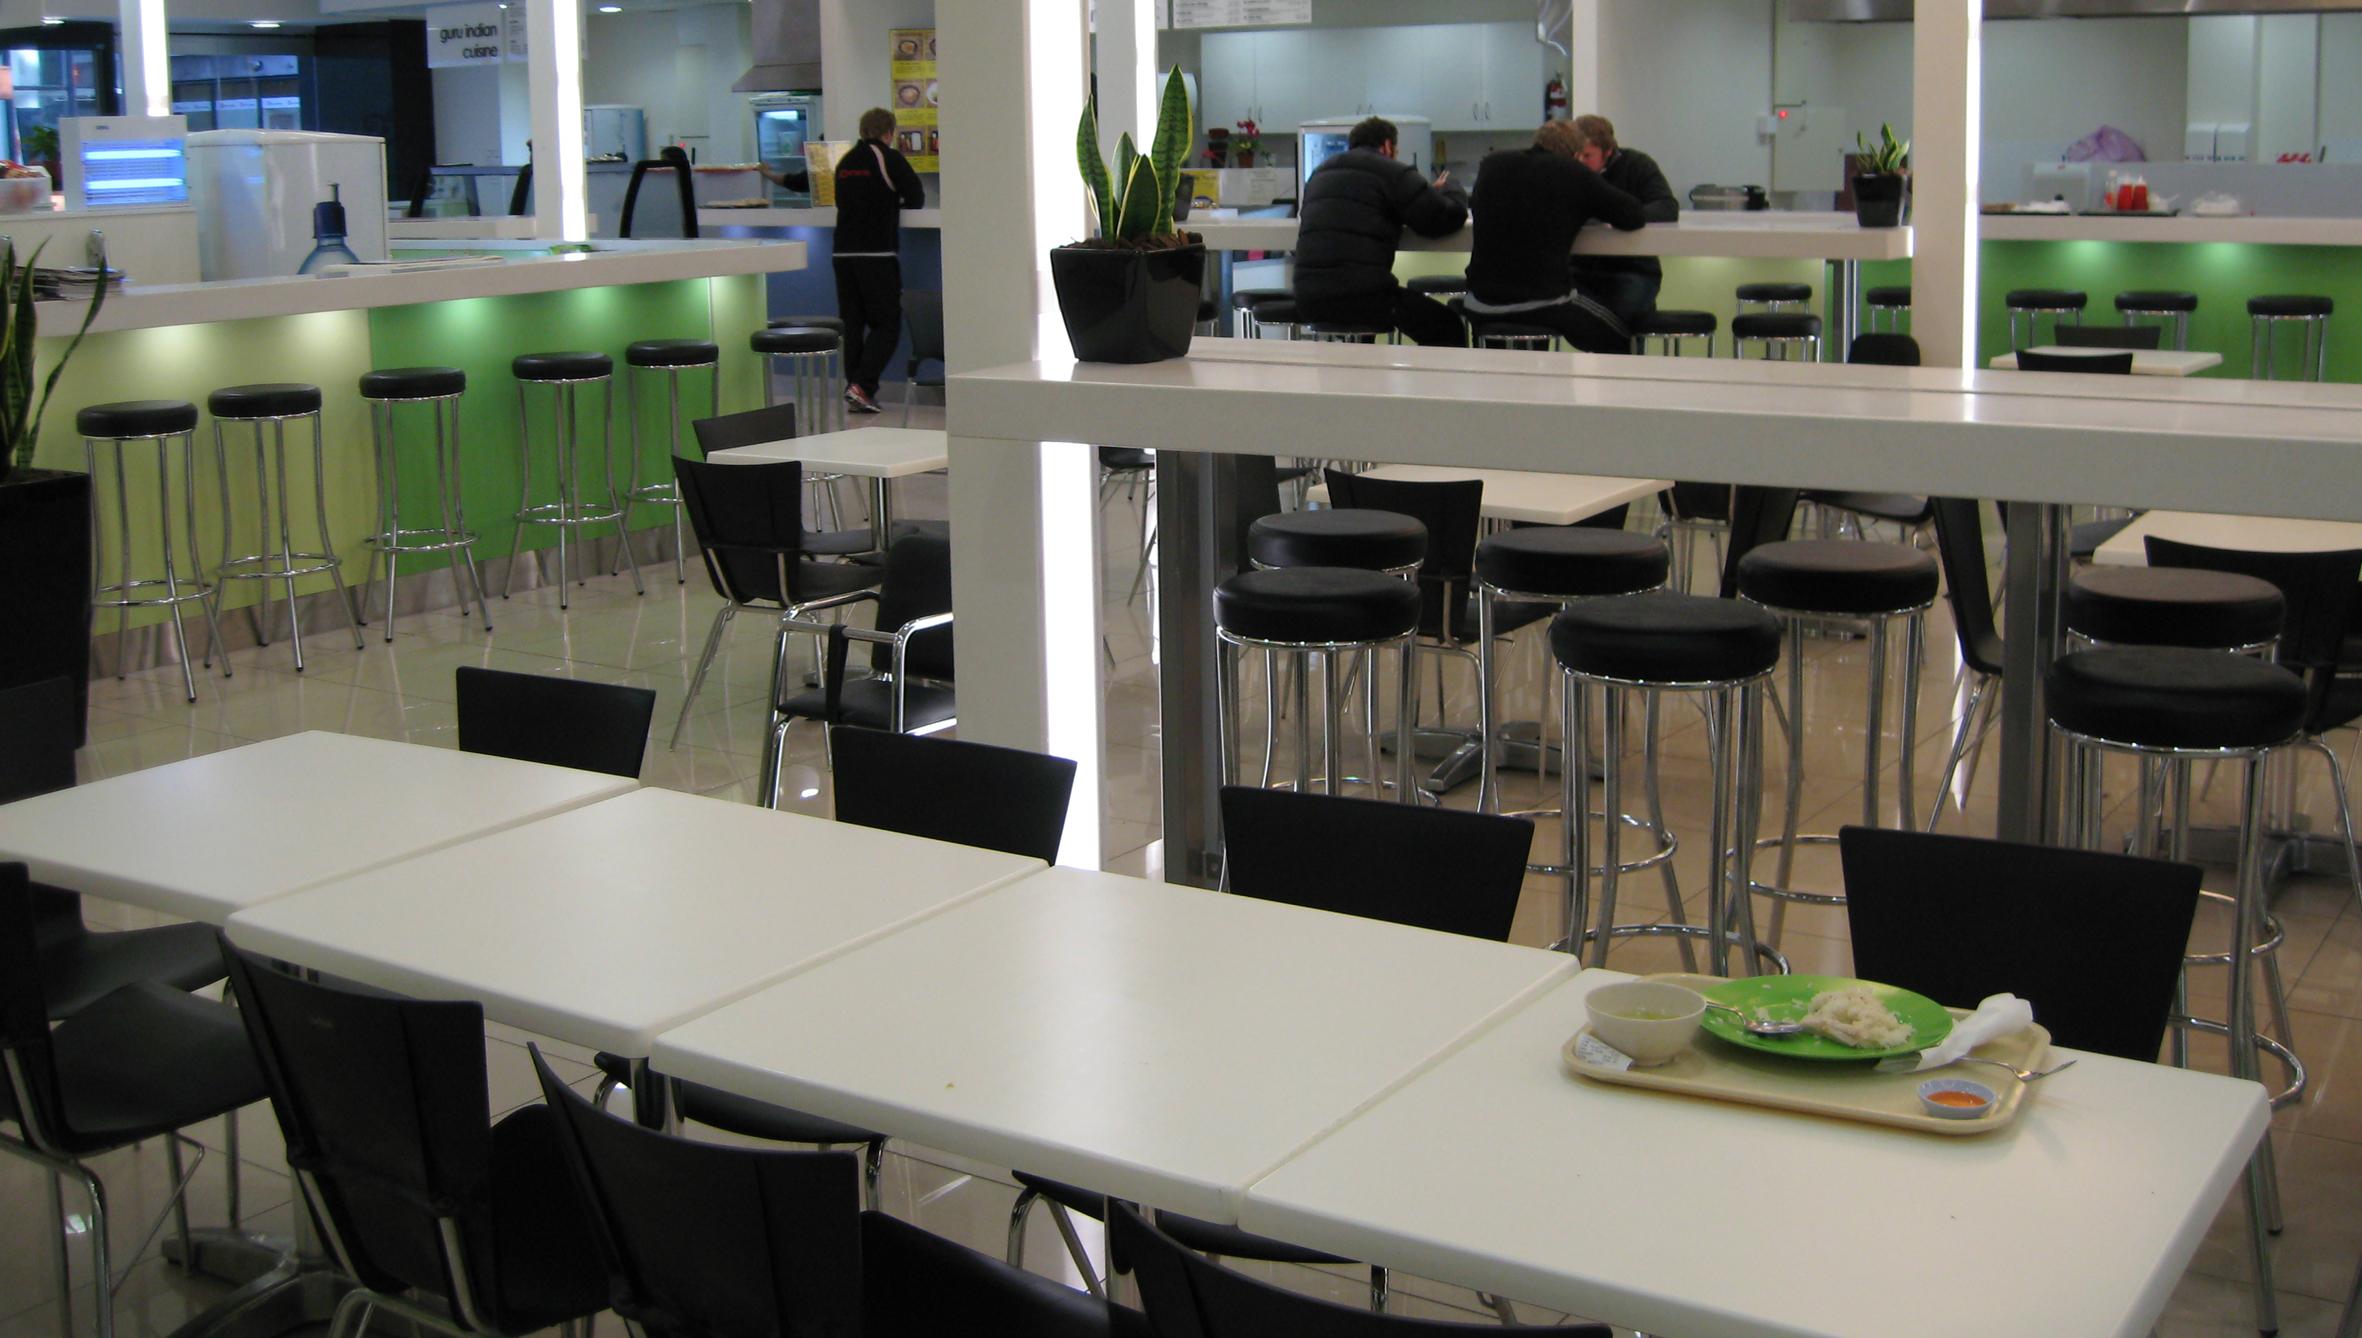 Cashel St food court